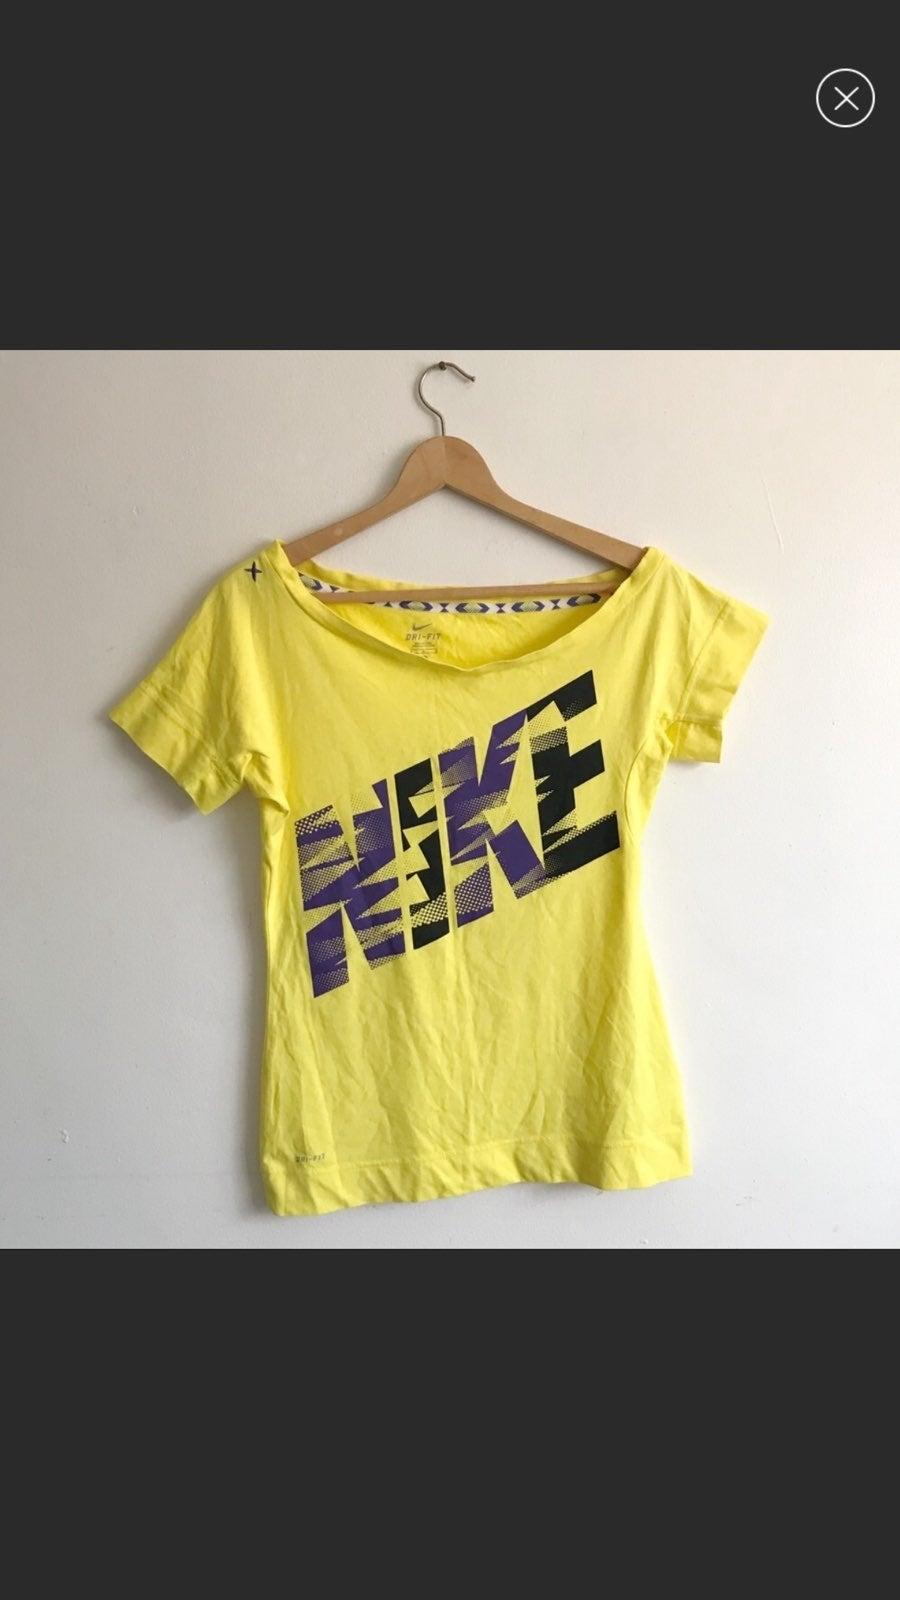 Nike Dri-fit yellow shirt